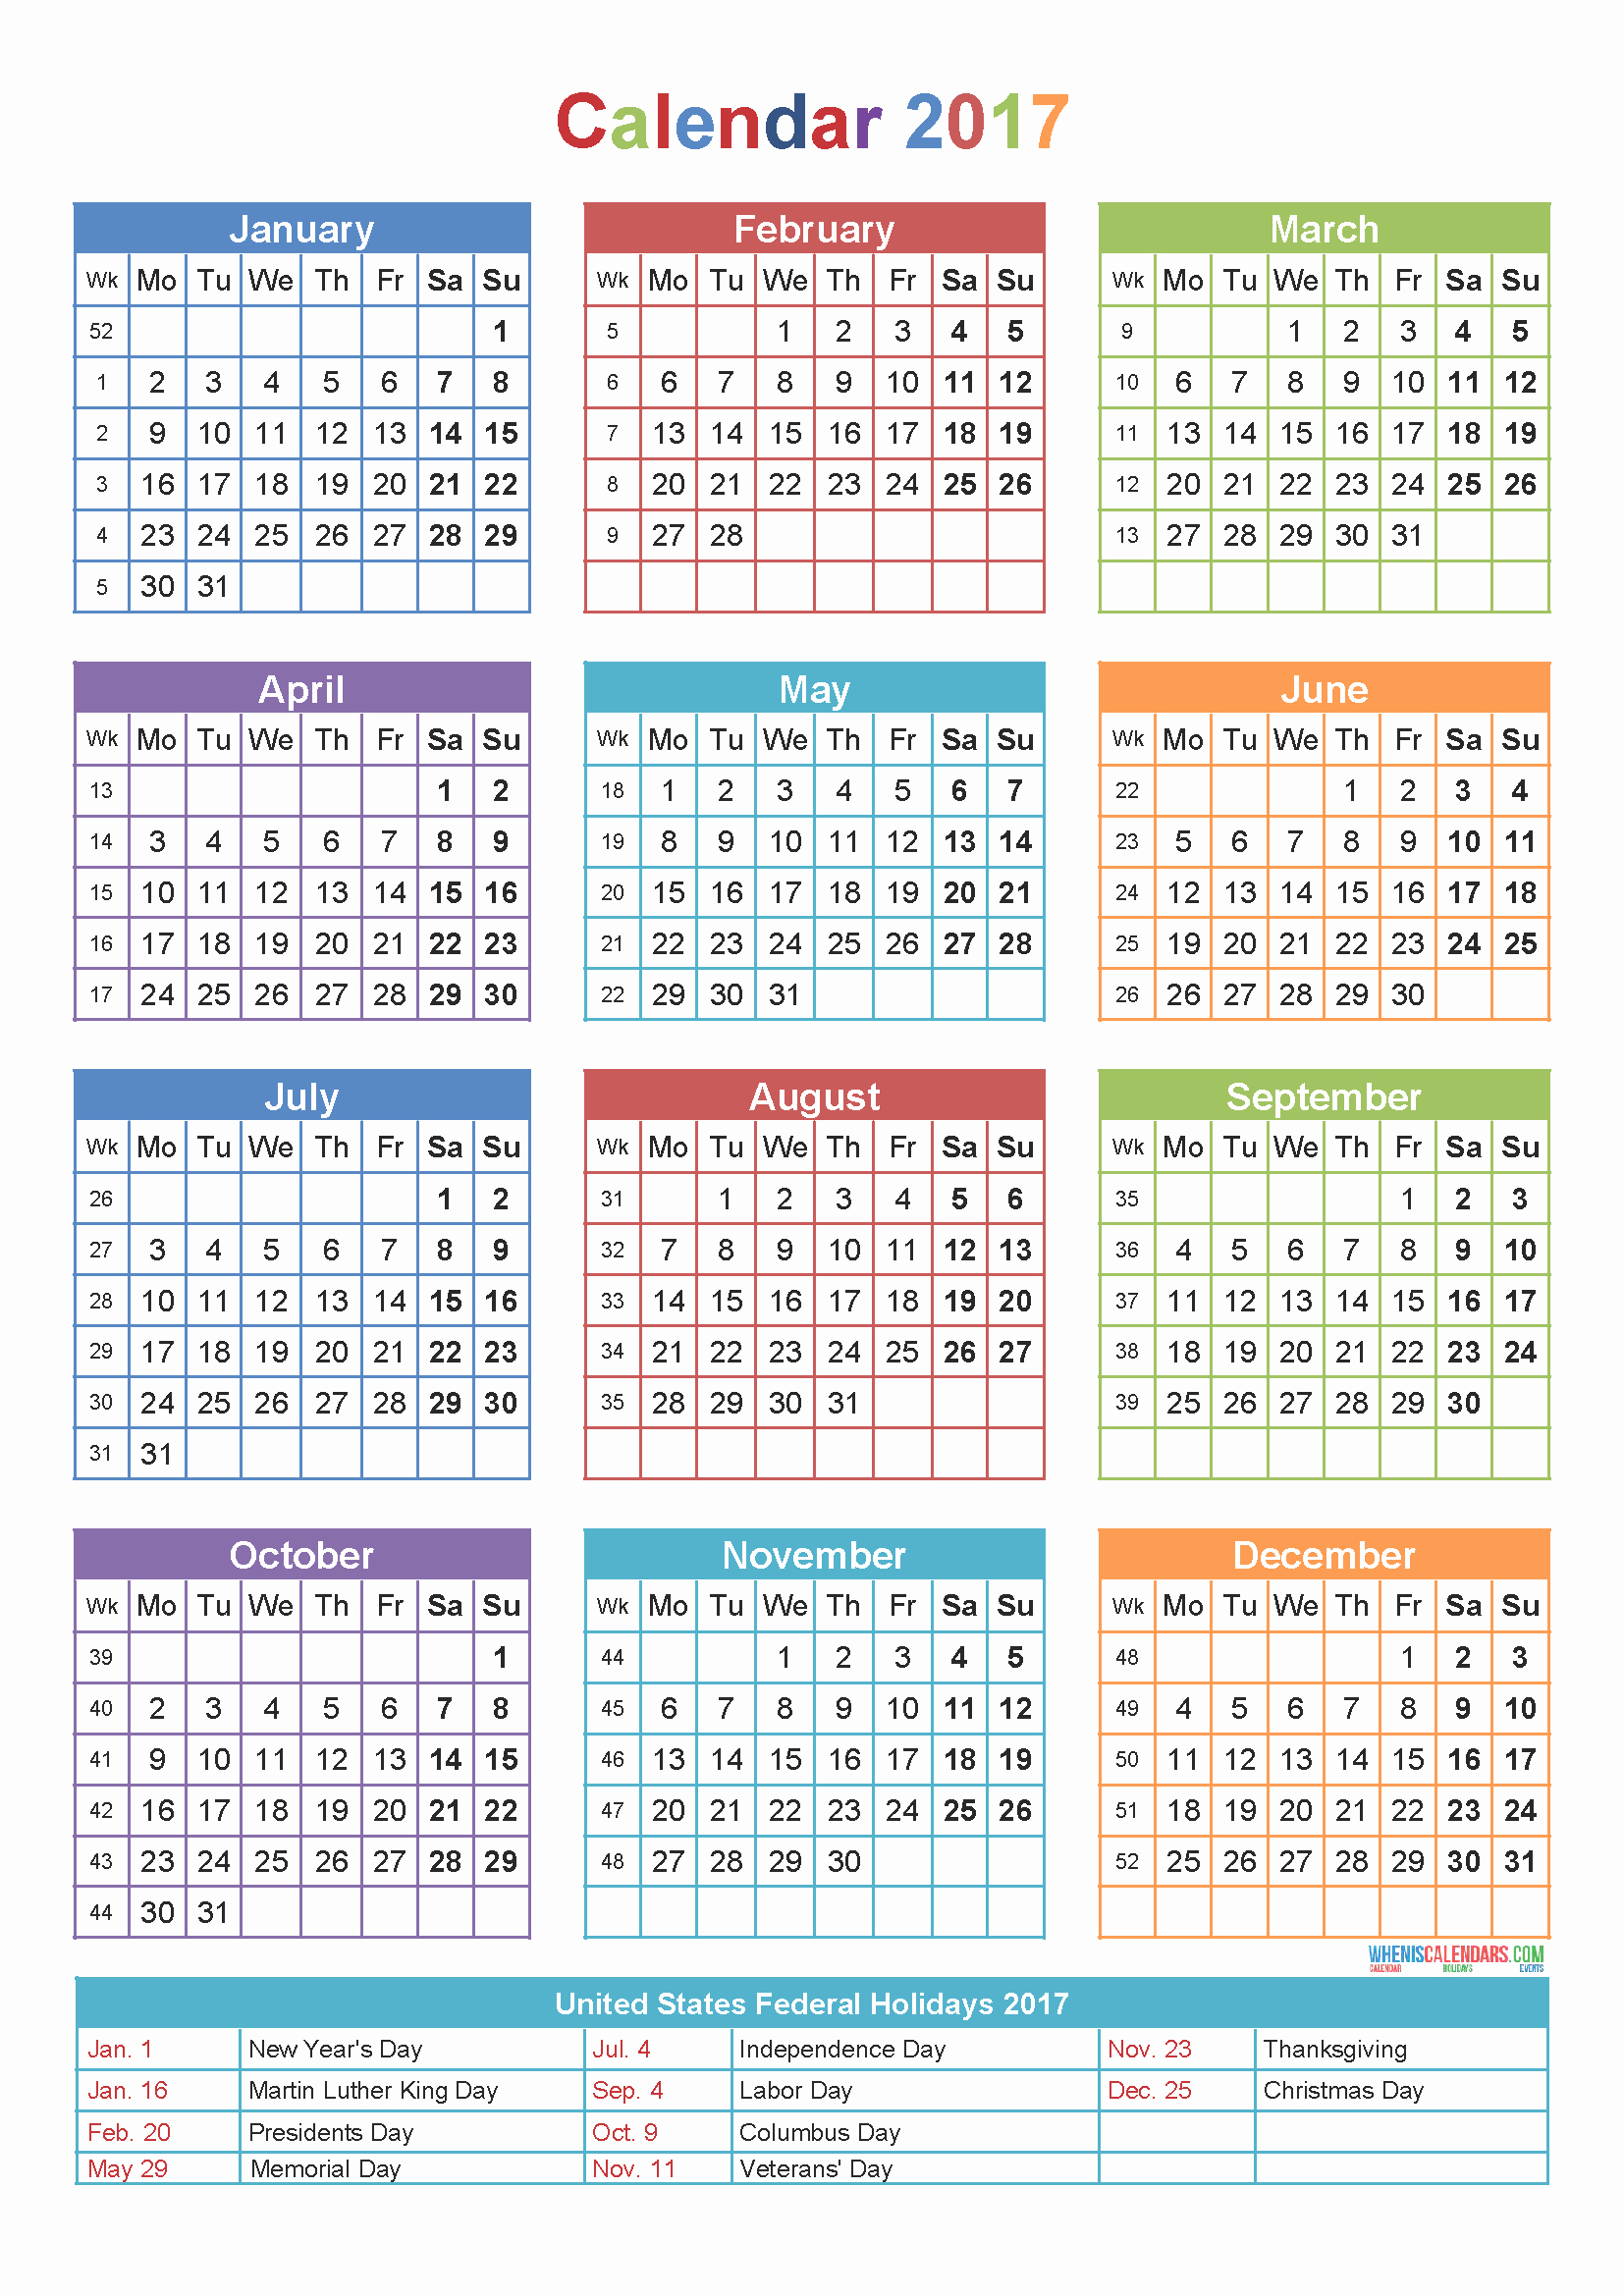 2017 Year Calendar Printable Free Beautiful 2017 Printable Yearly Calendar with Holidays